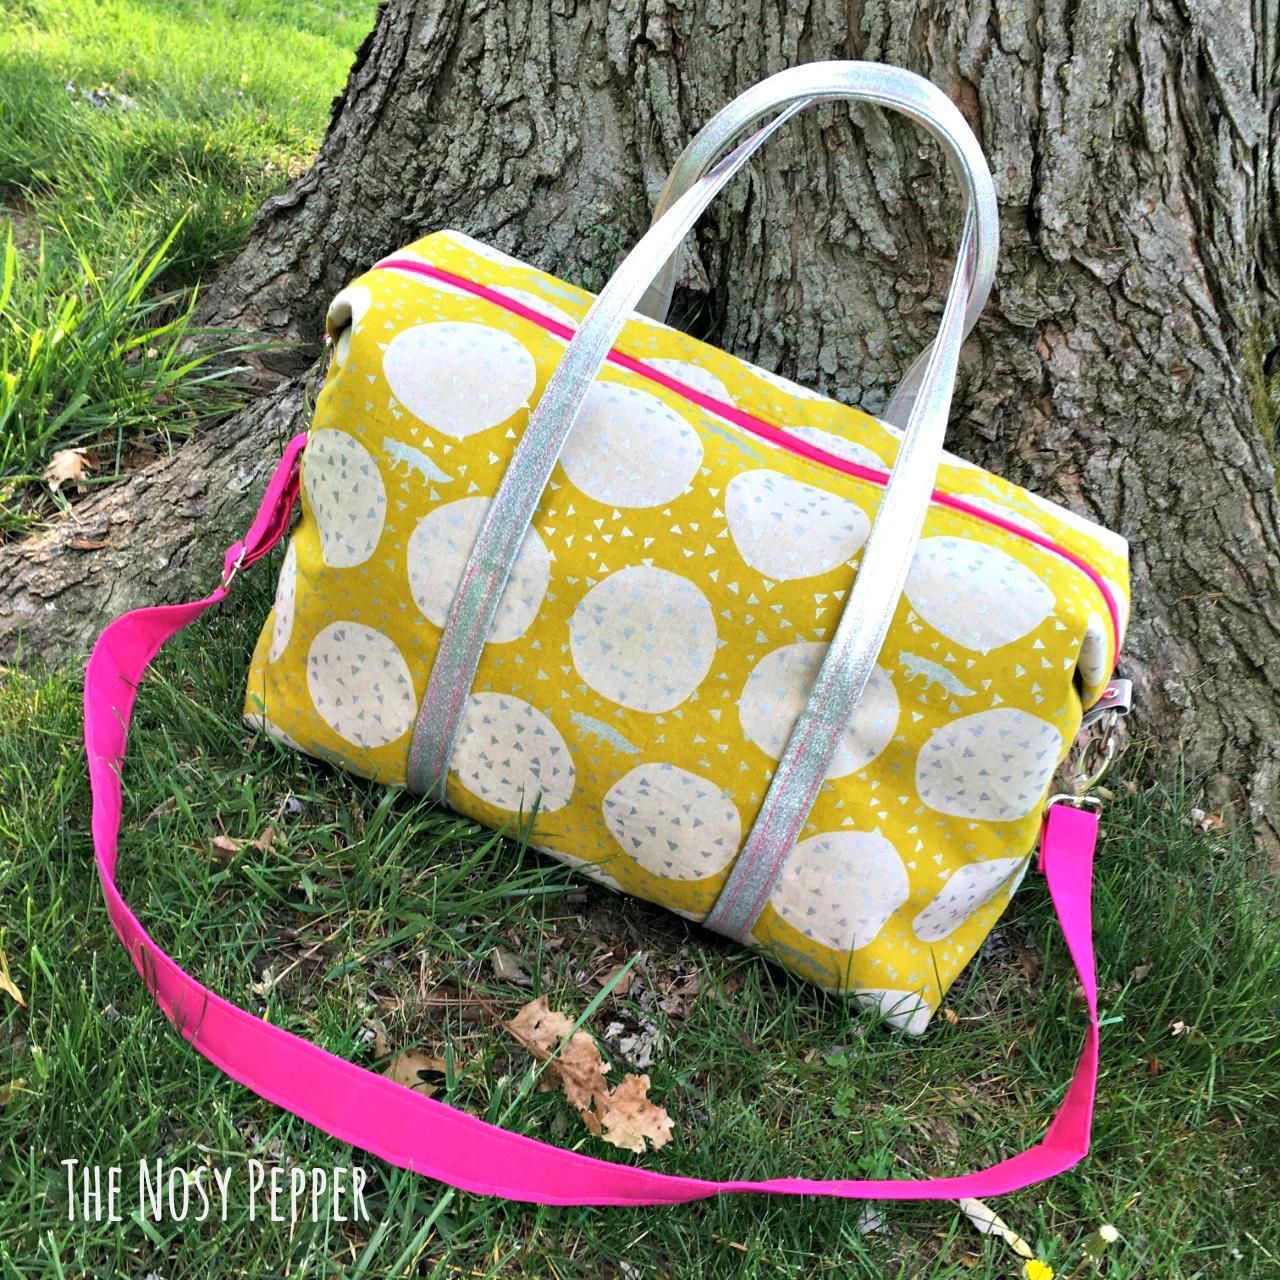 Sew Sweetness Emblem Duffle Bag, sewn by Cyndi of the Nosy Pepper